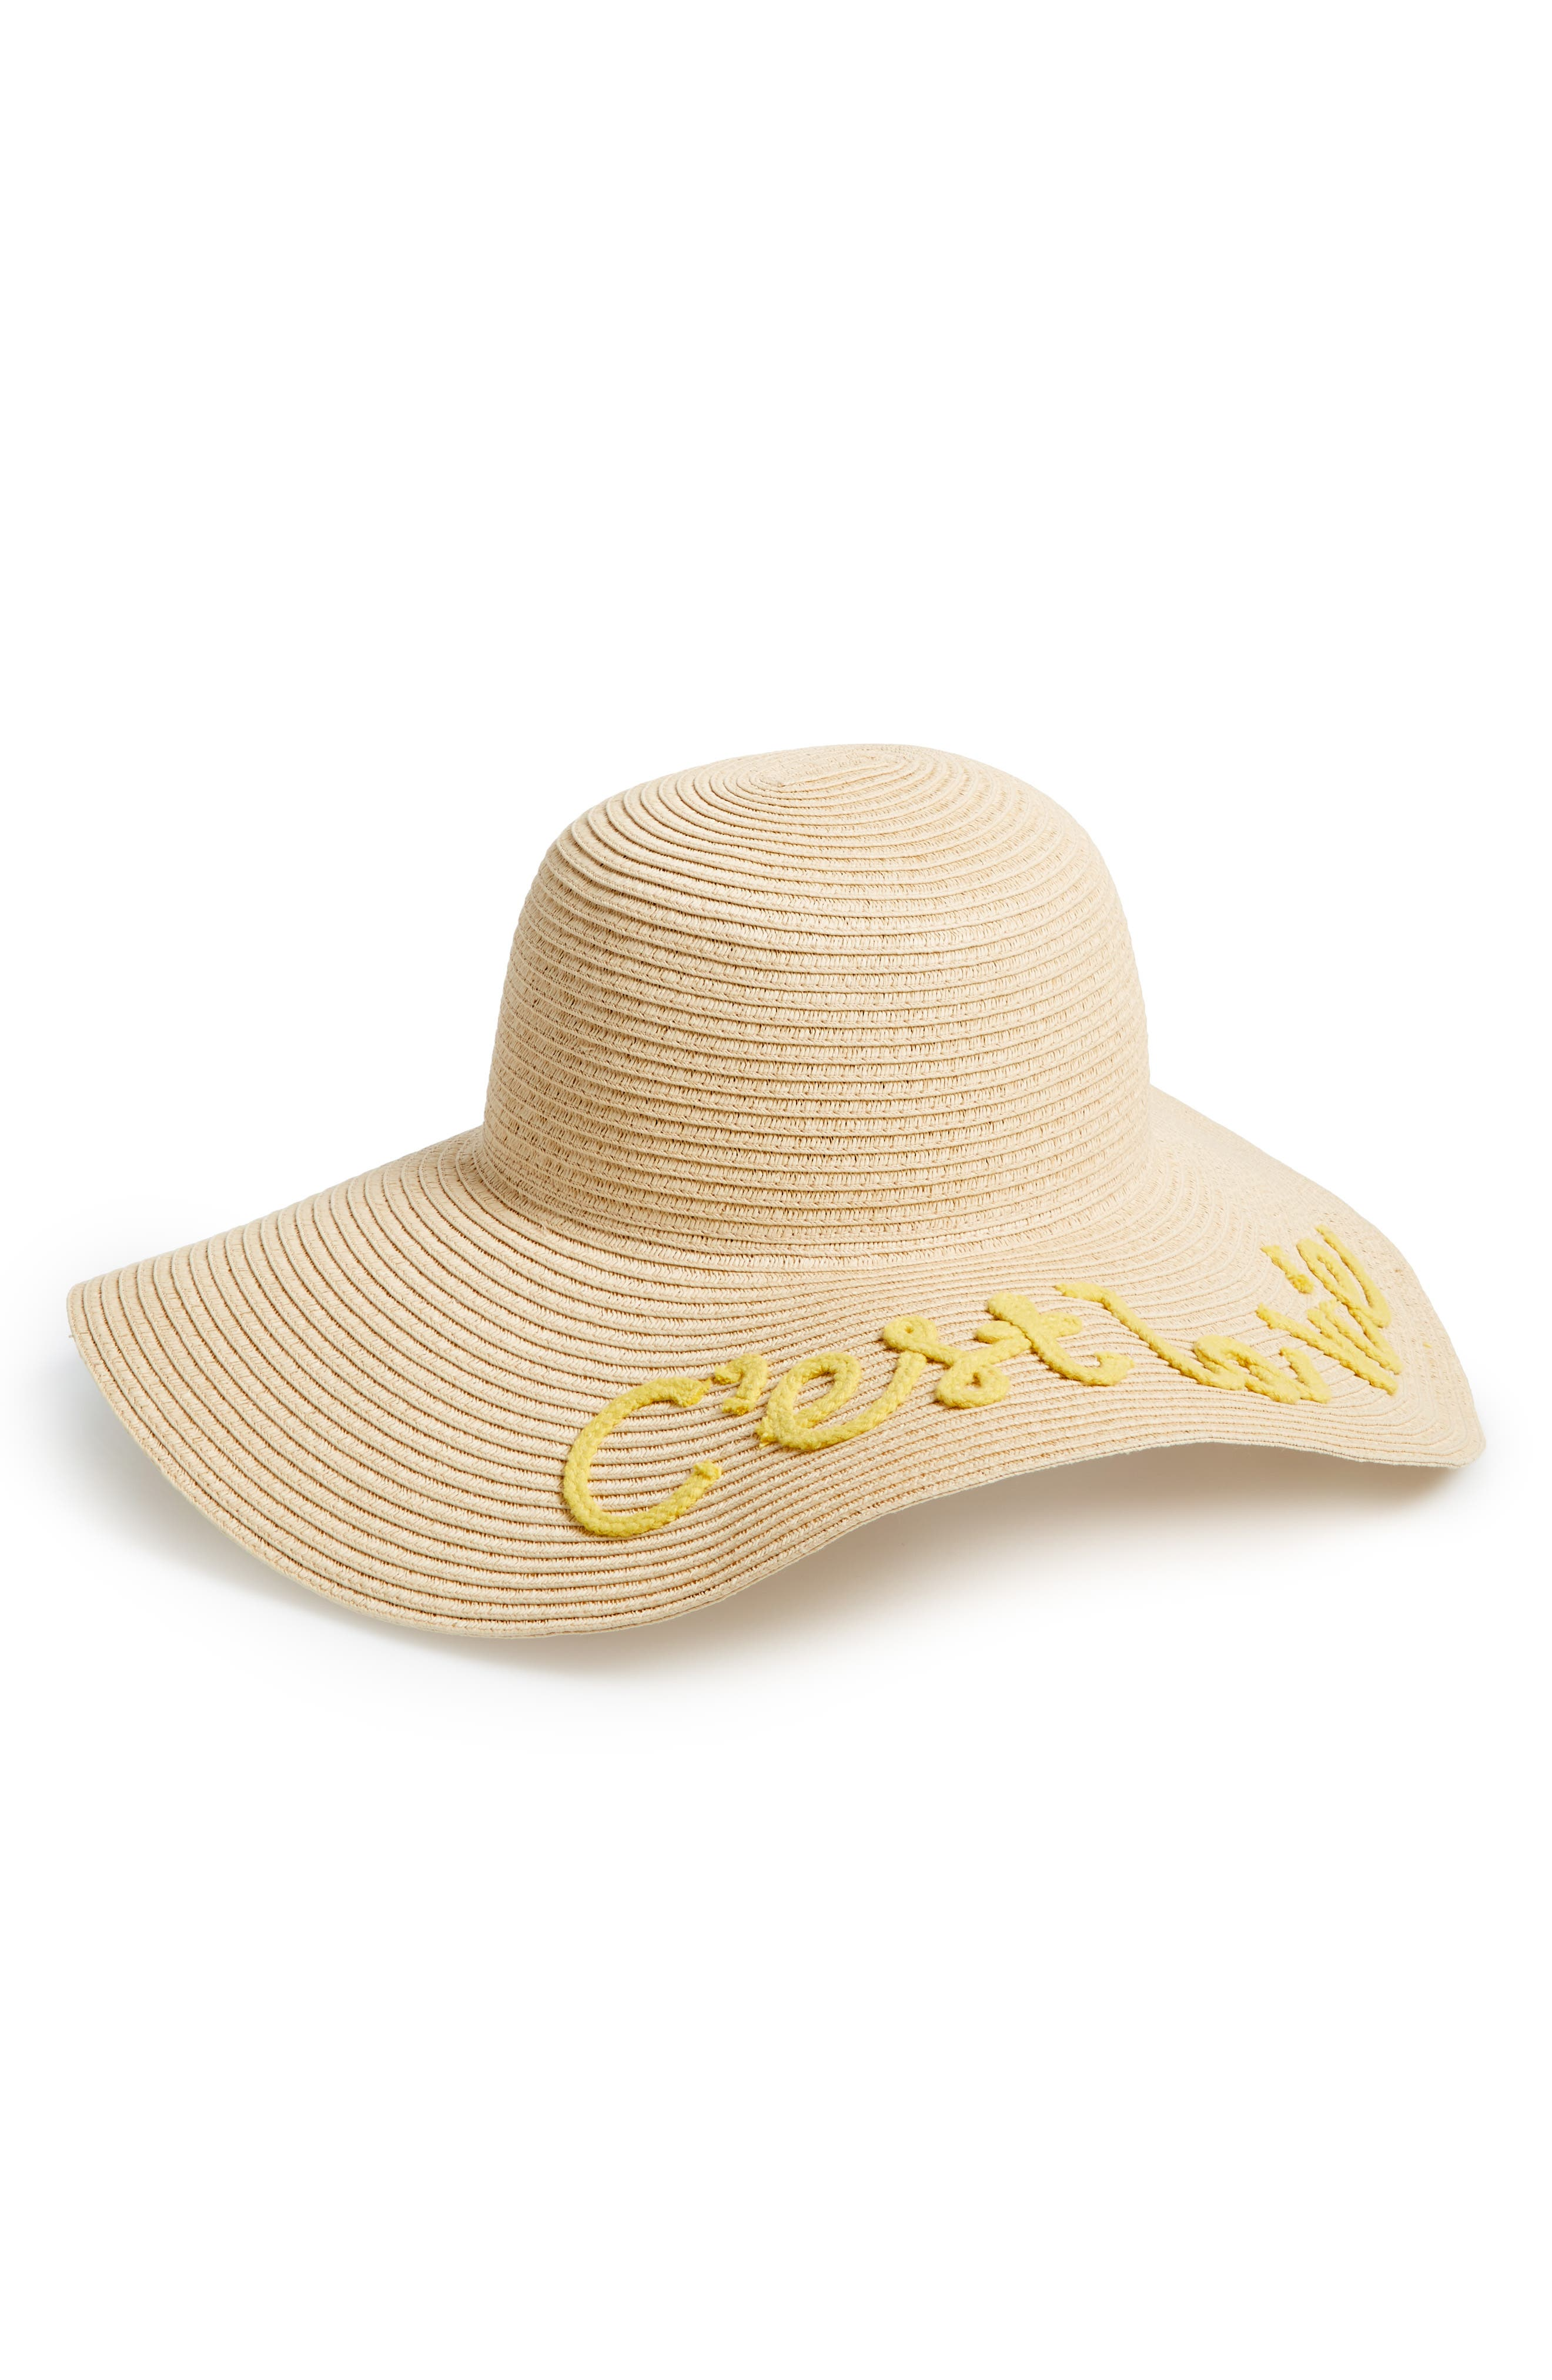 BP. C'est La Vie Floppy Straw Hat